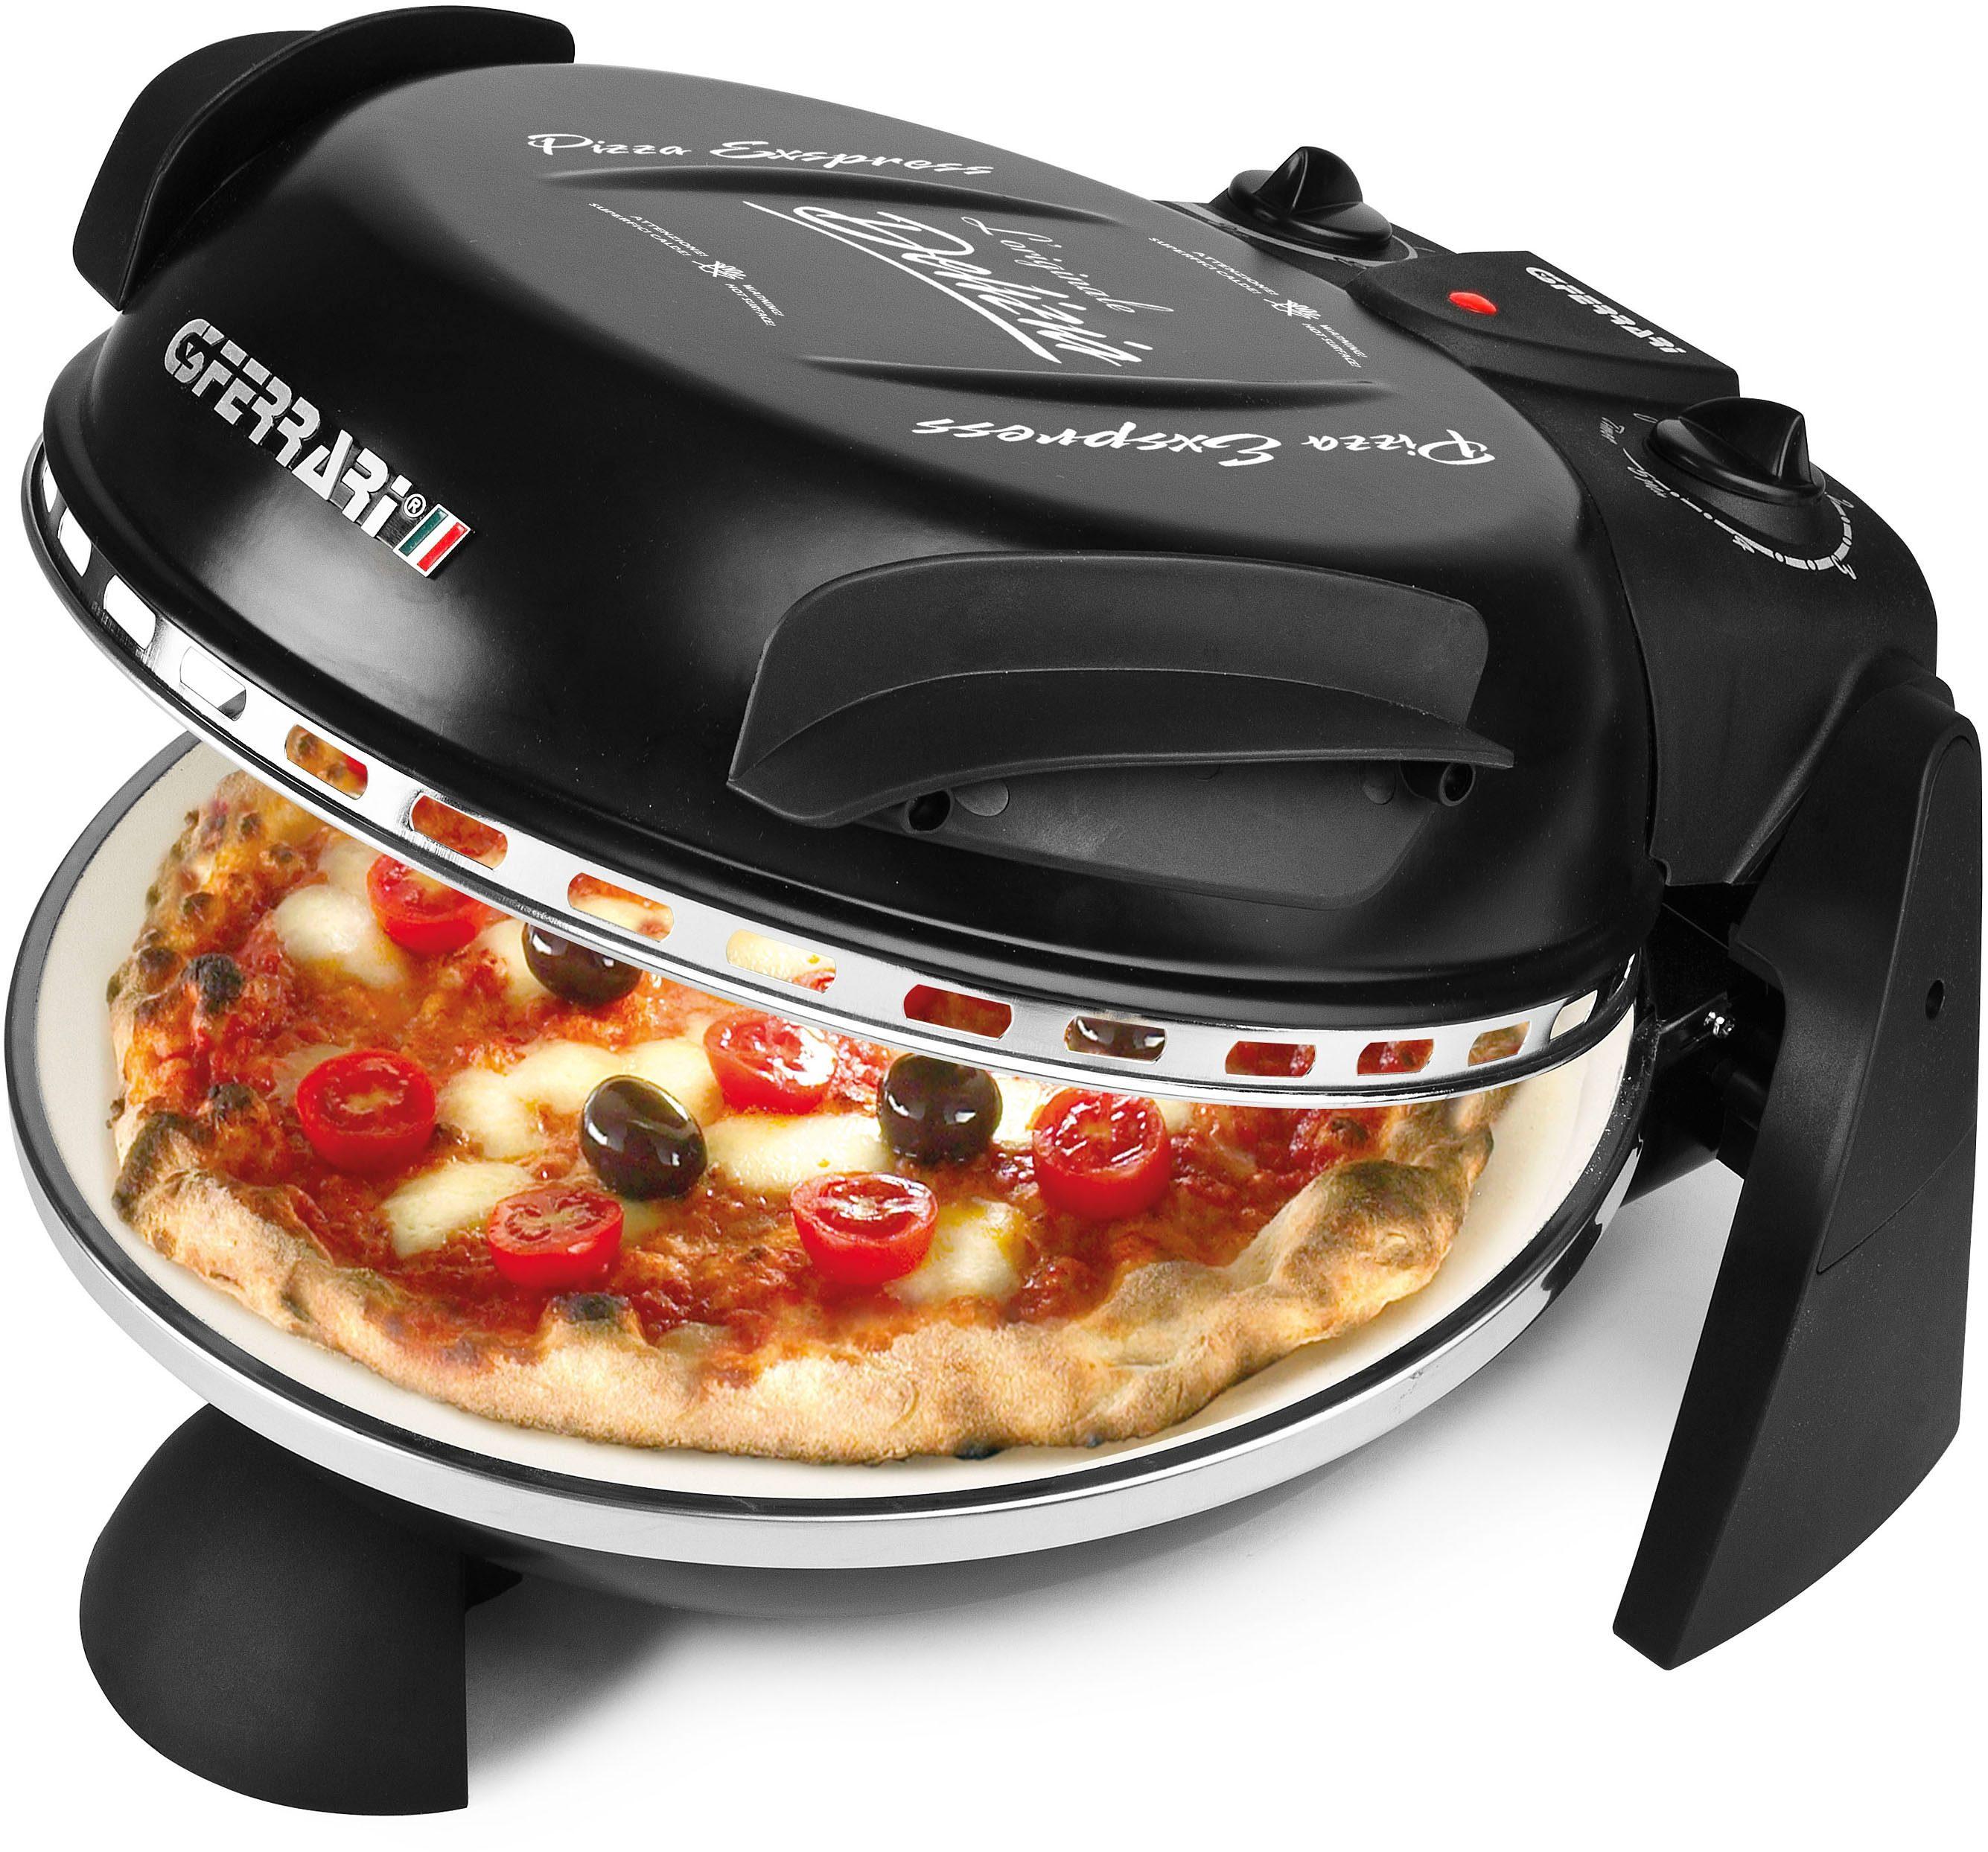 G3Ferrari Pizzamaker Delizia G10006B - Black Edition